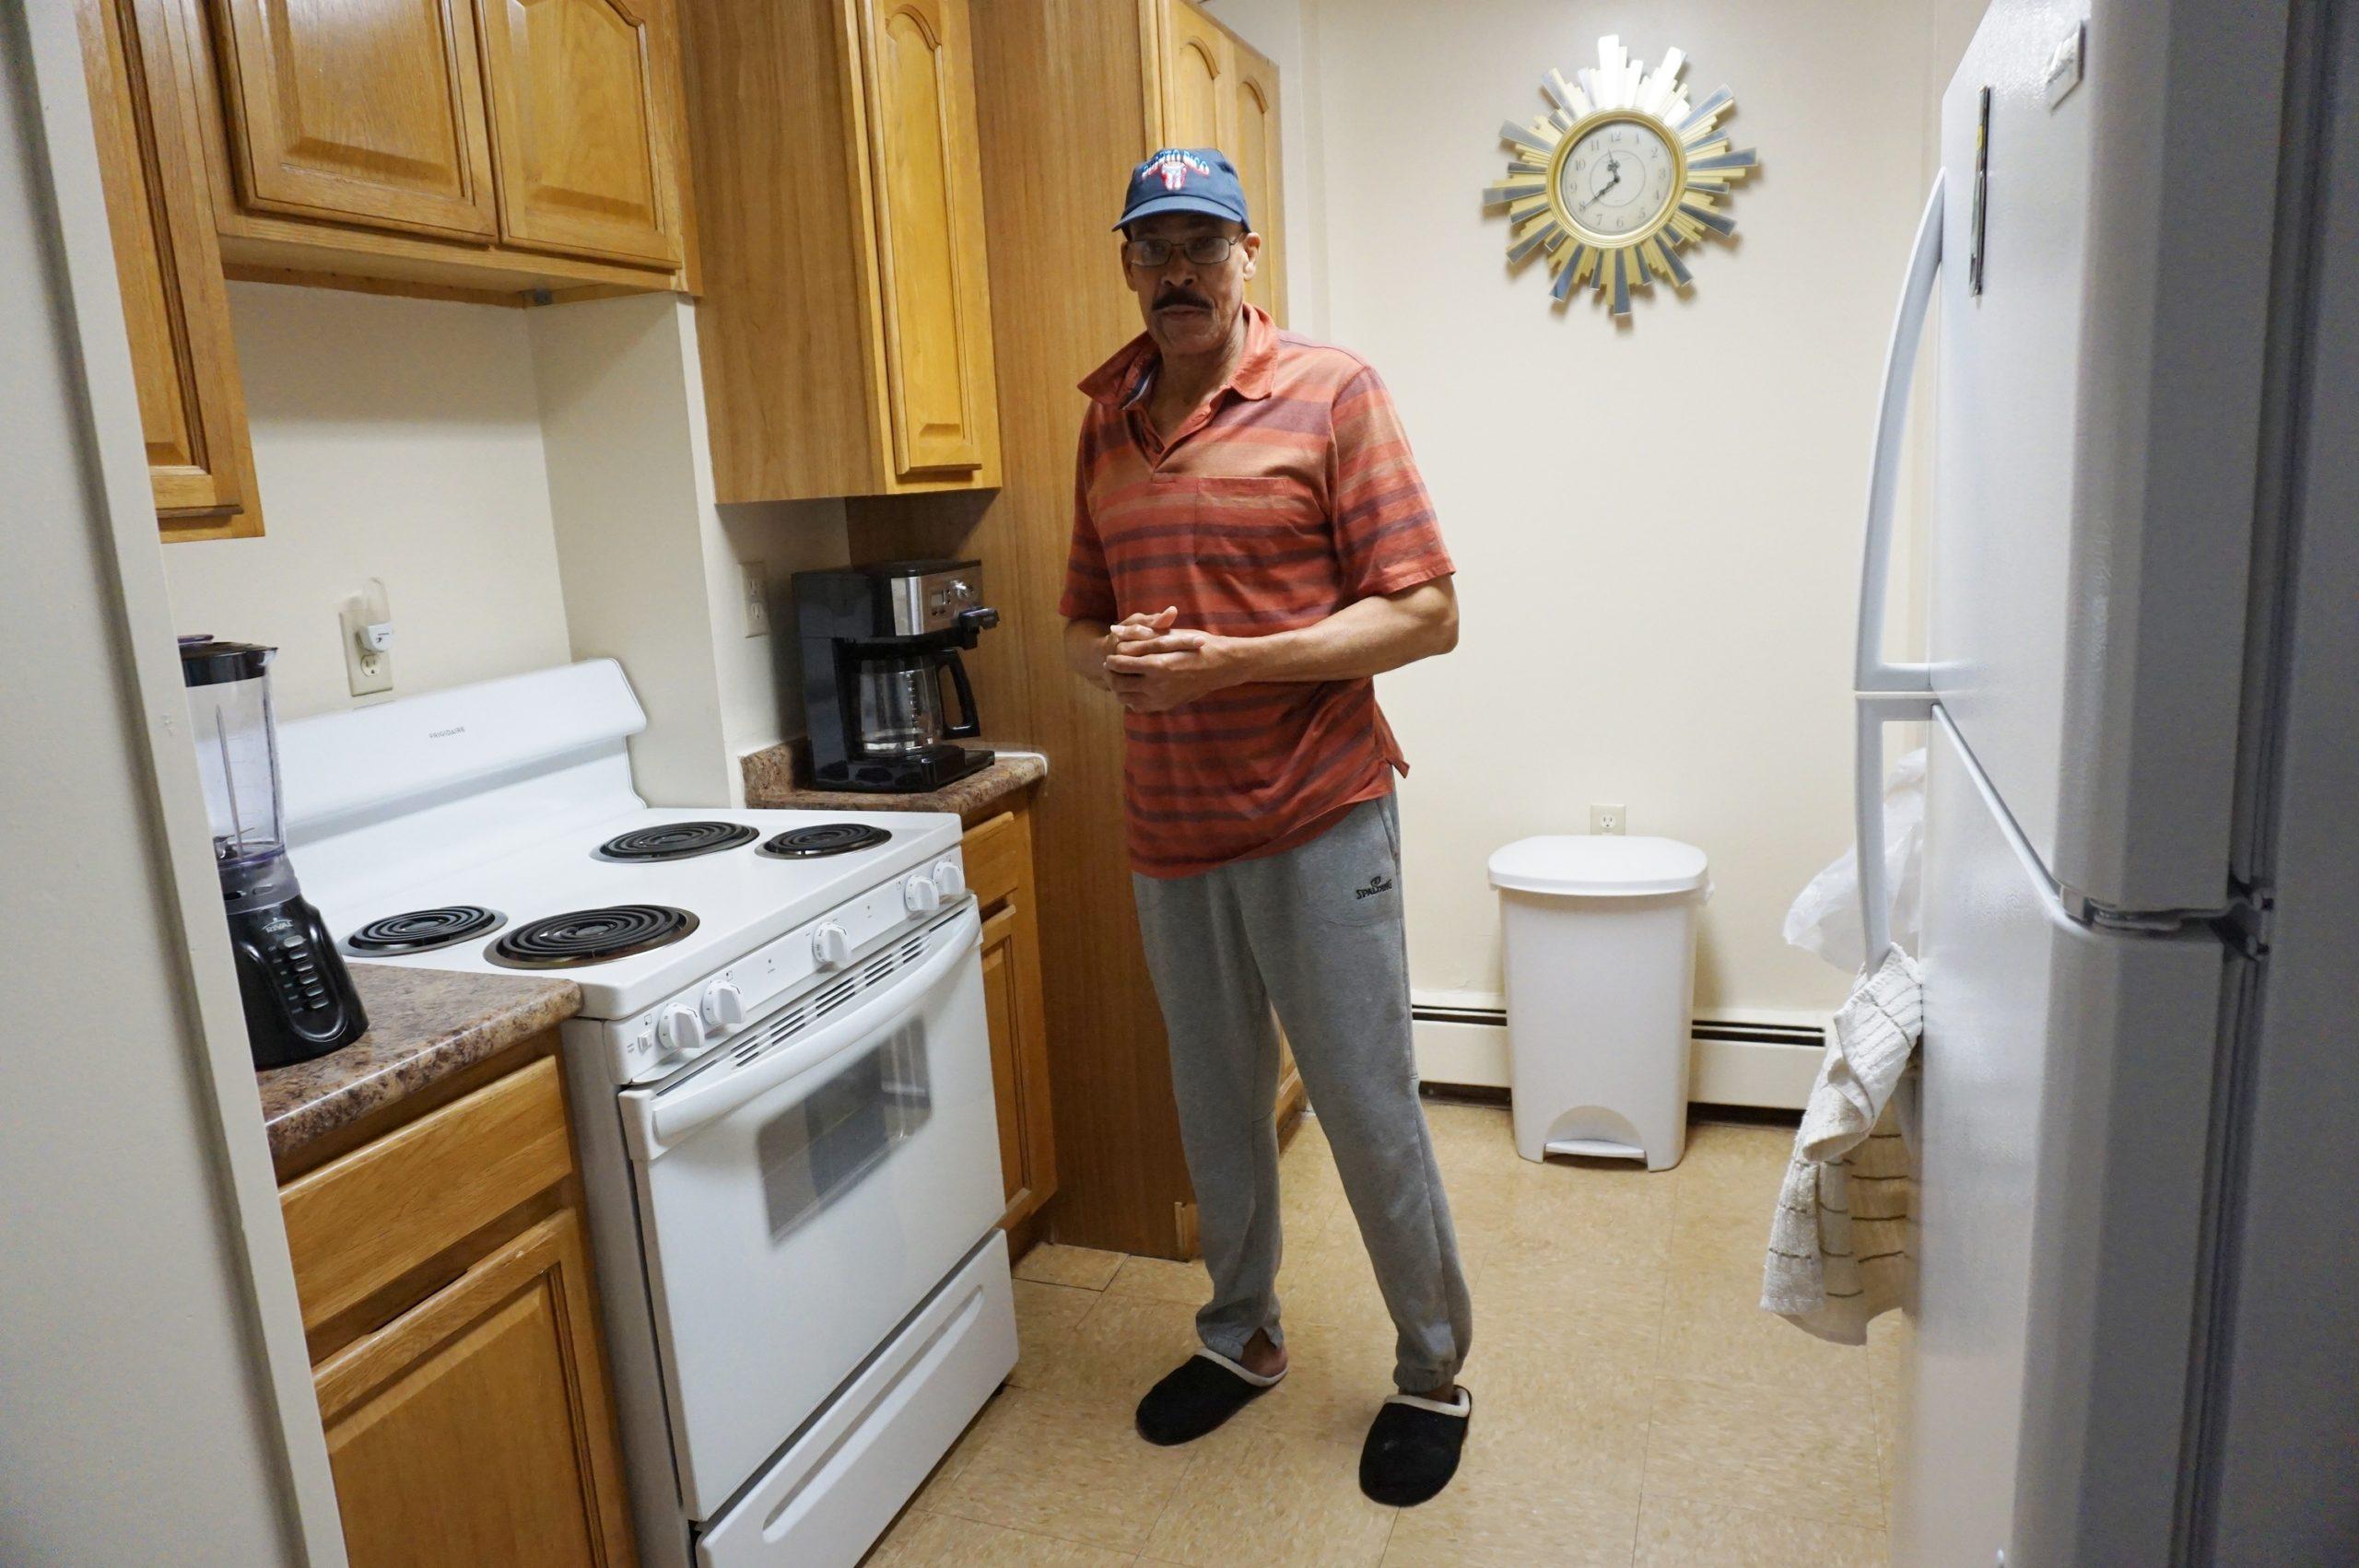 New Community Seniors Enjoy Renovated Apartments